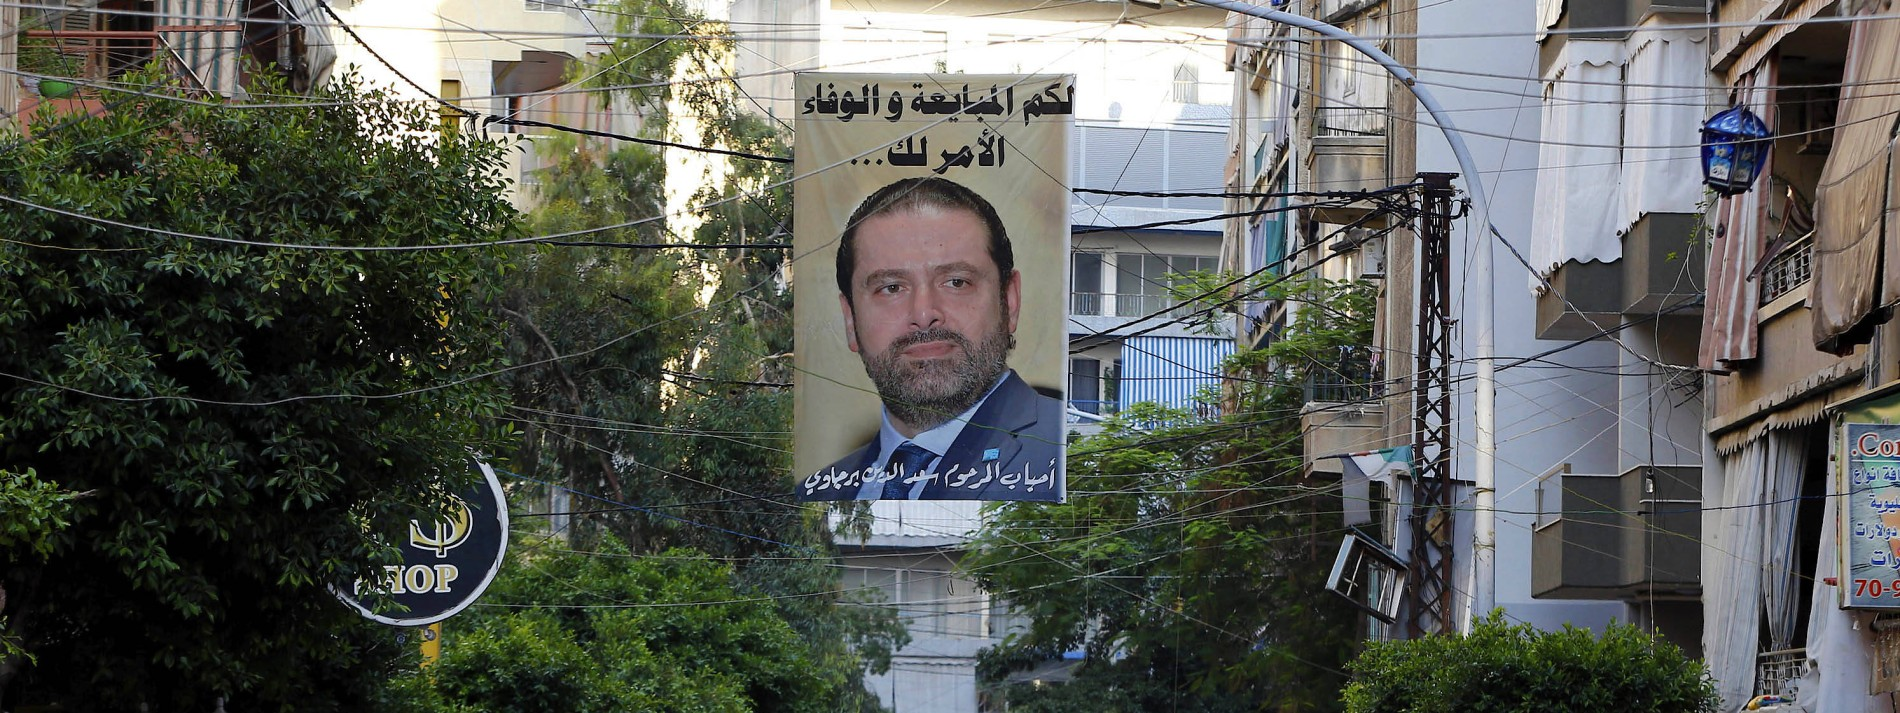 Hizbullah am Pranger